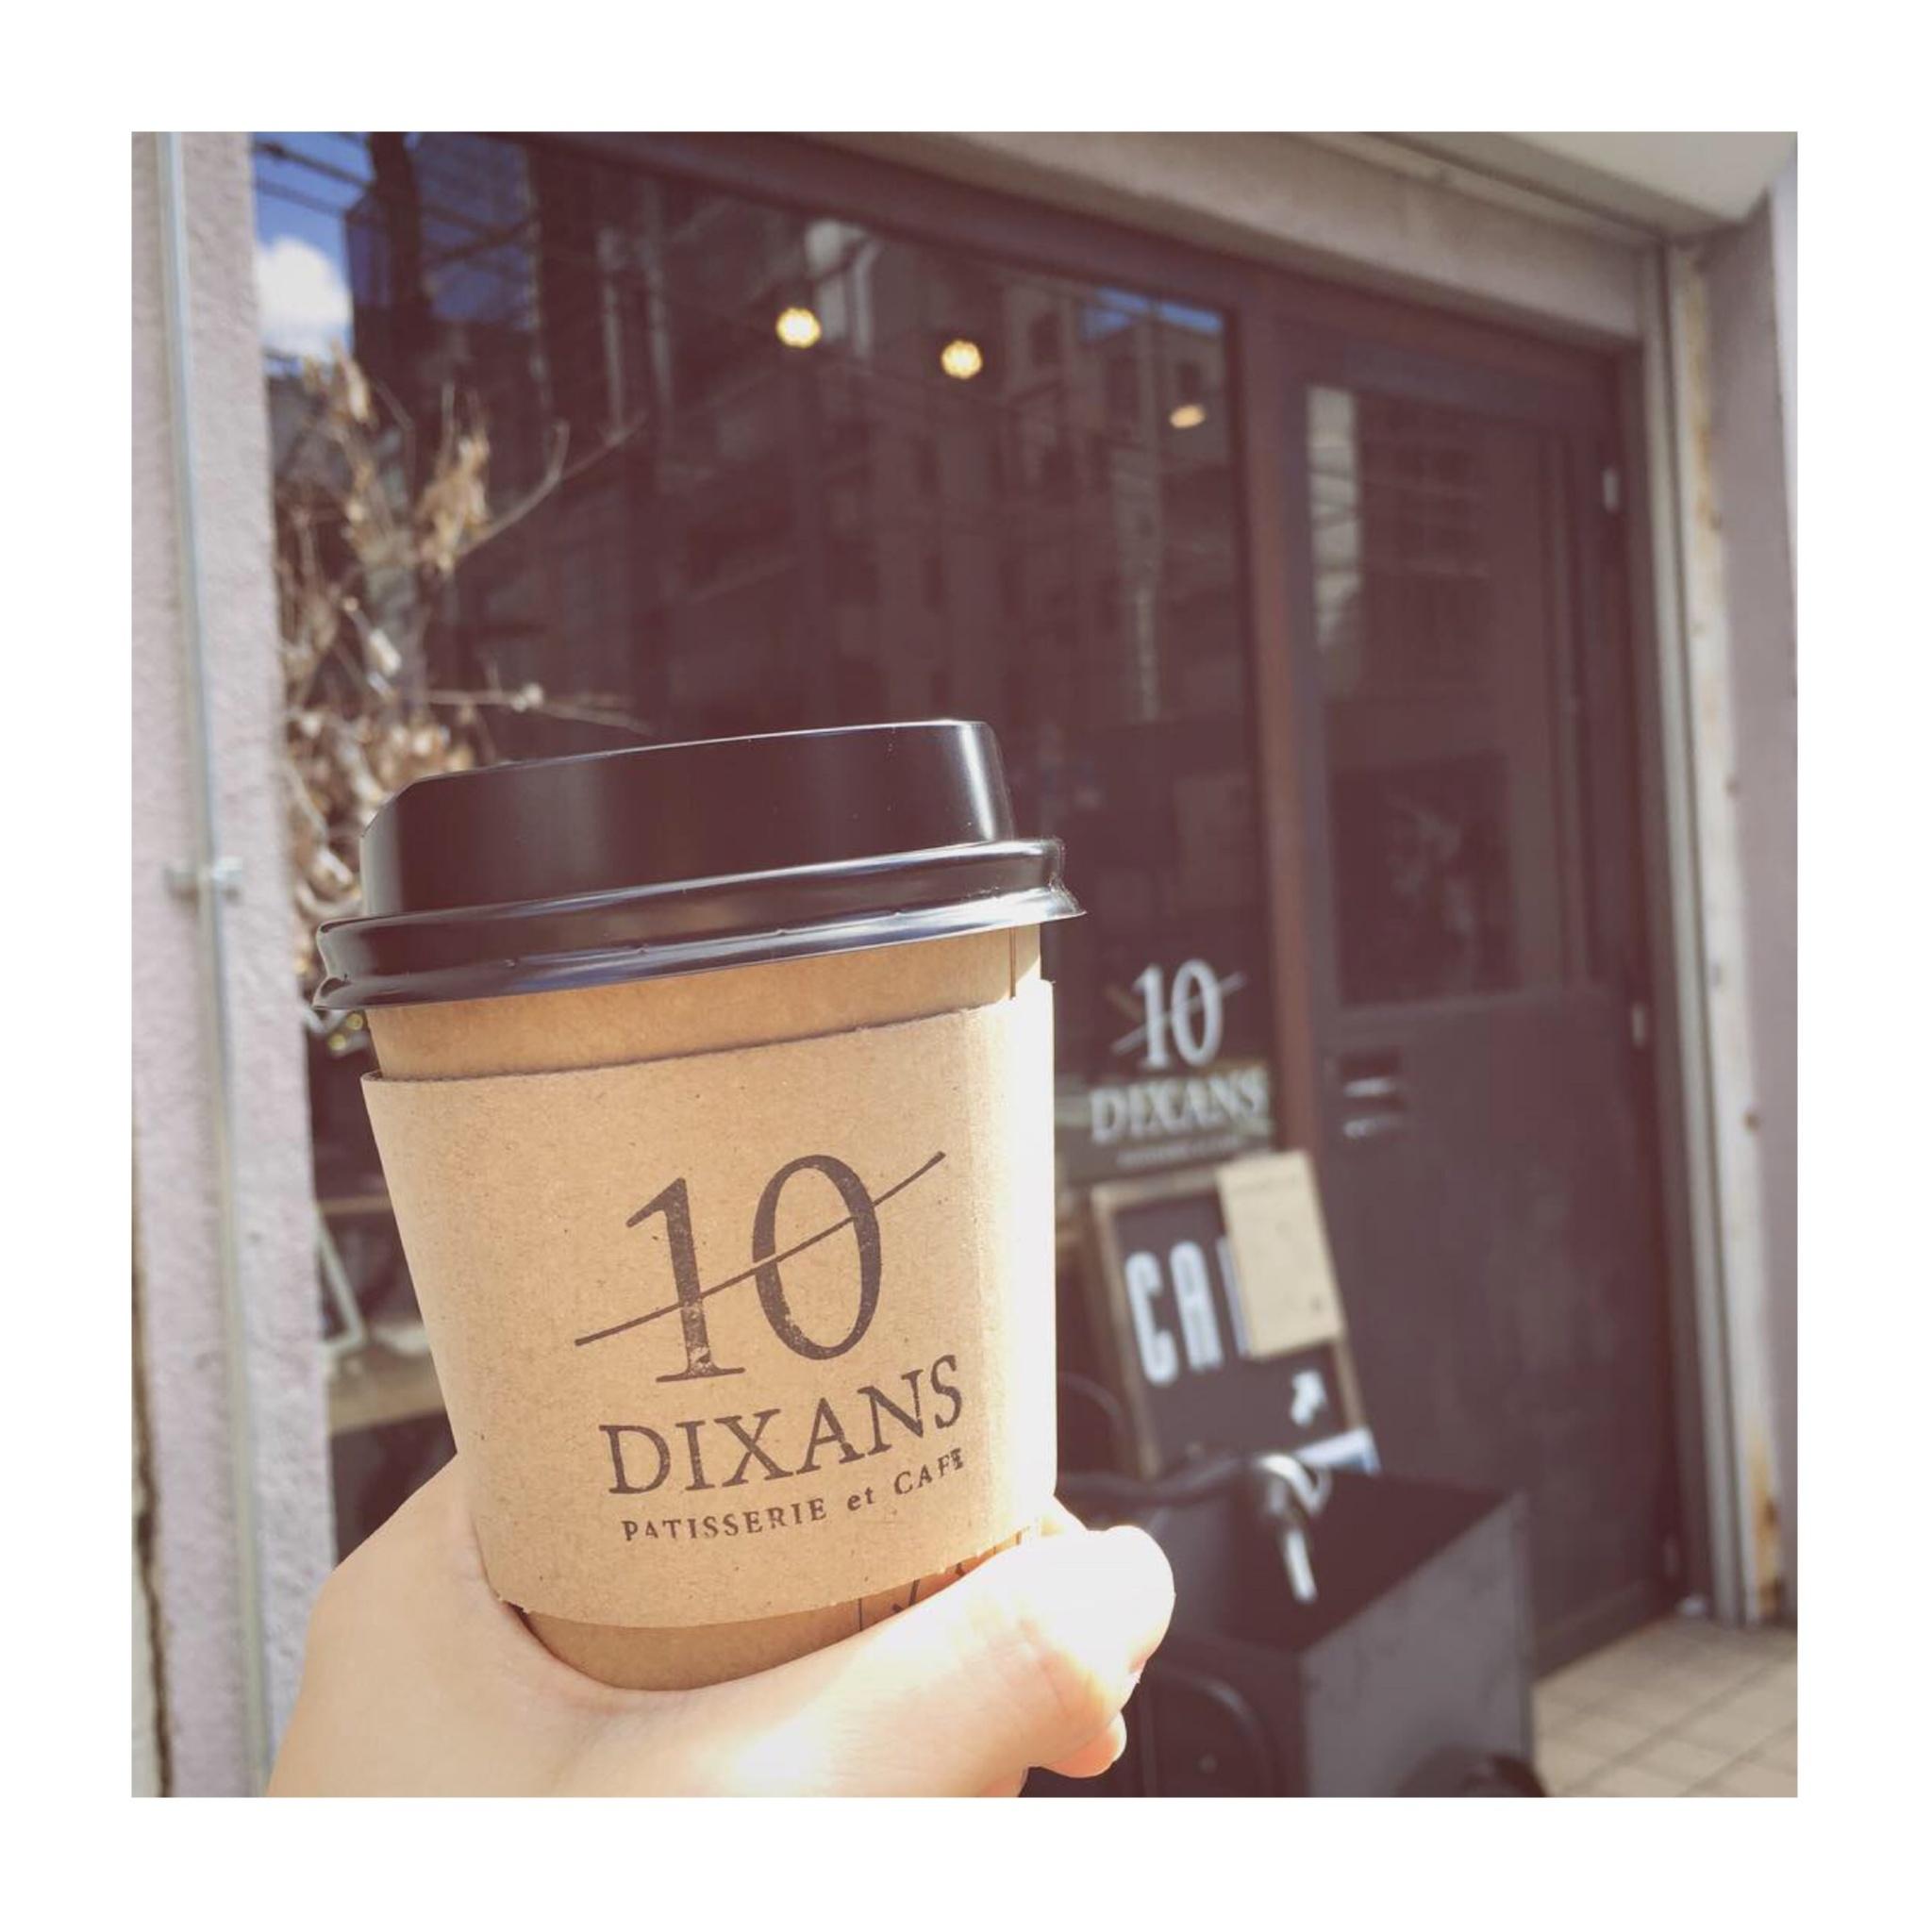 #12【#cafestagram】❤️:《東京•水道橋》ふわふわ絶品!厚切りトーストと可愛いラテアートが人気のカフェ「DIXANS」☻_1